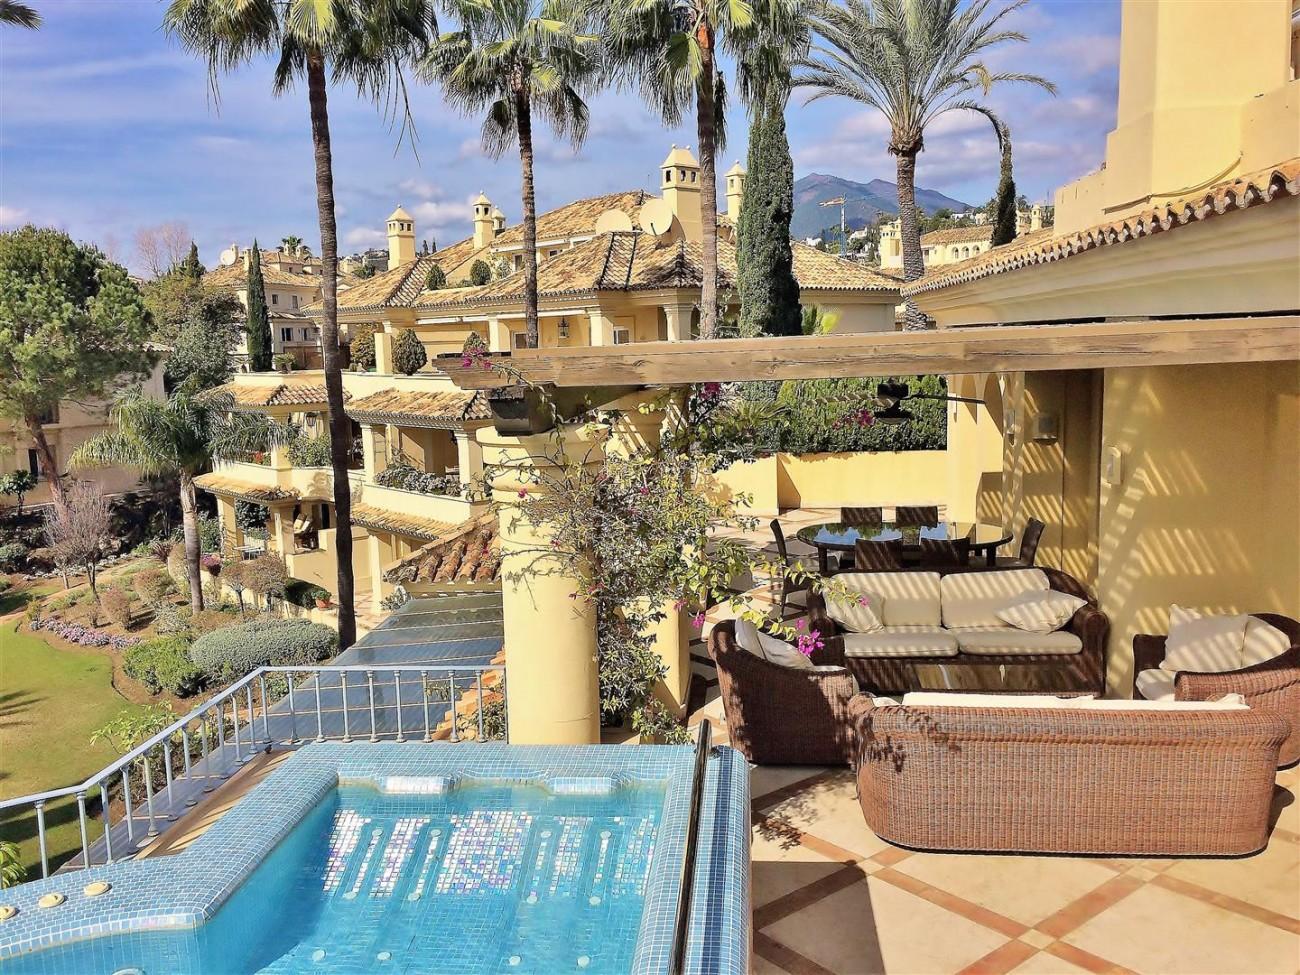 Penthouse for sale Las Alamandas Nueva Andalucia Marbella Spain (22) (Large)